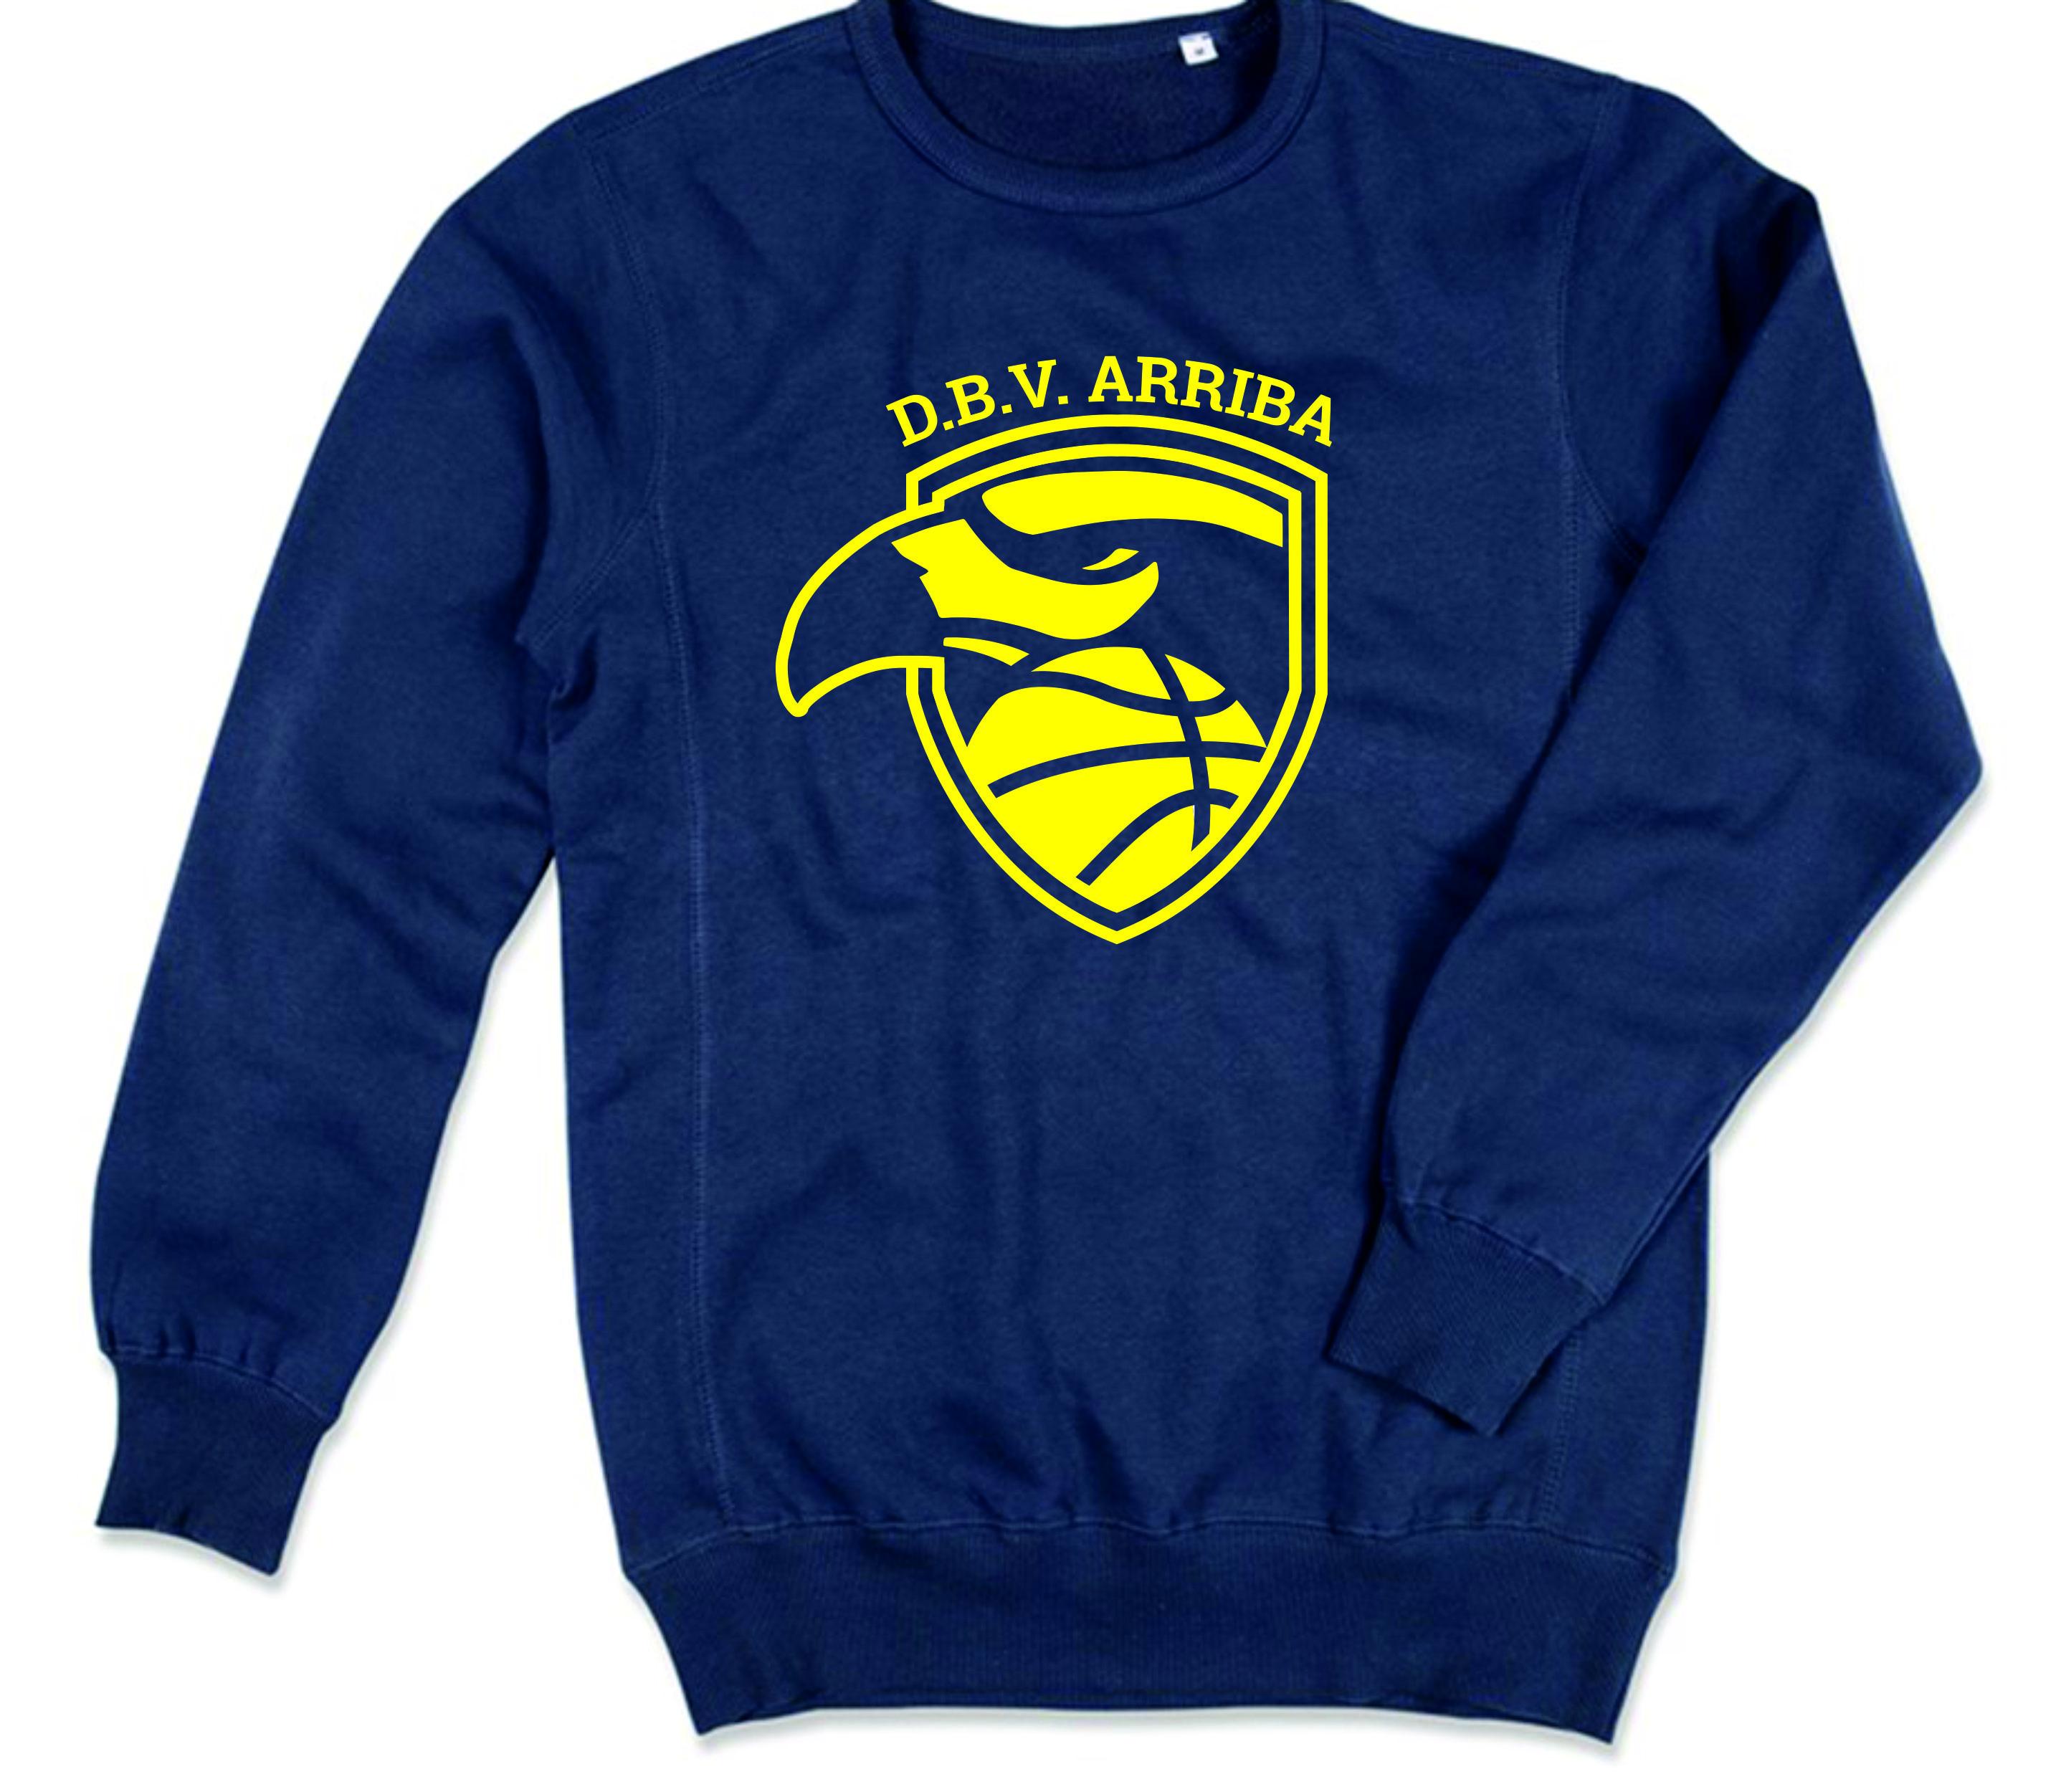 Blue sweater (big logo) Image